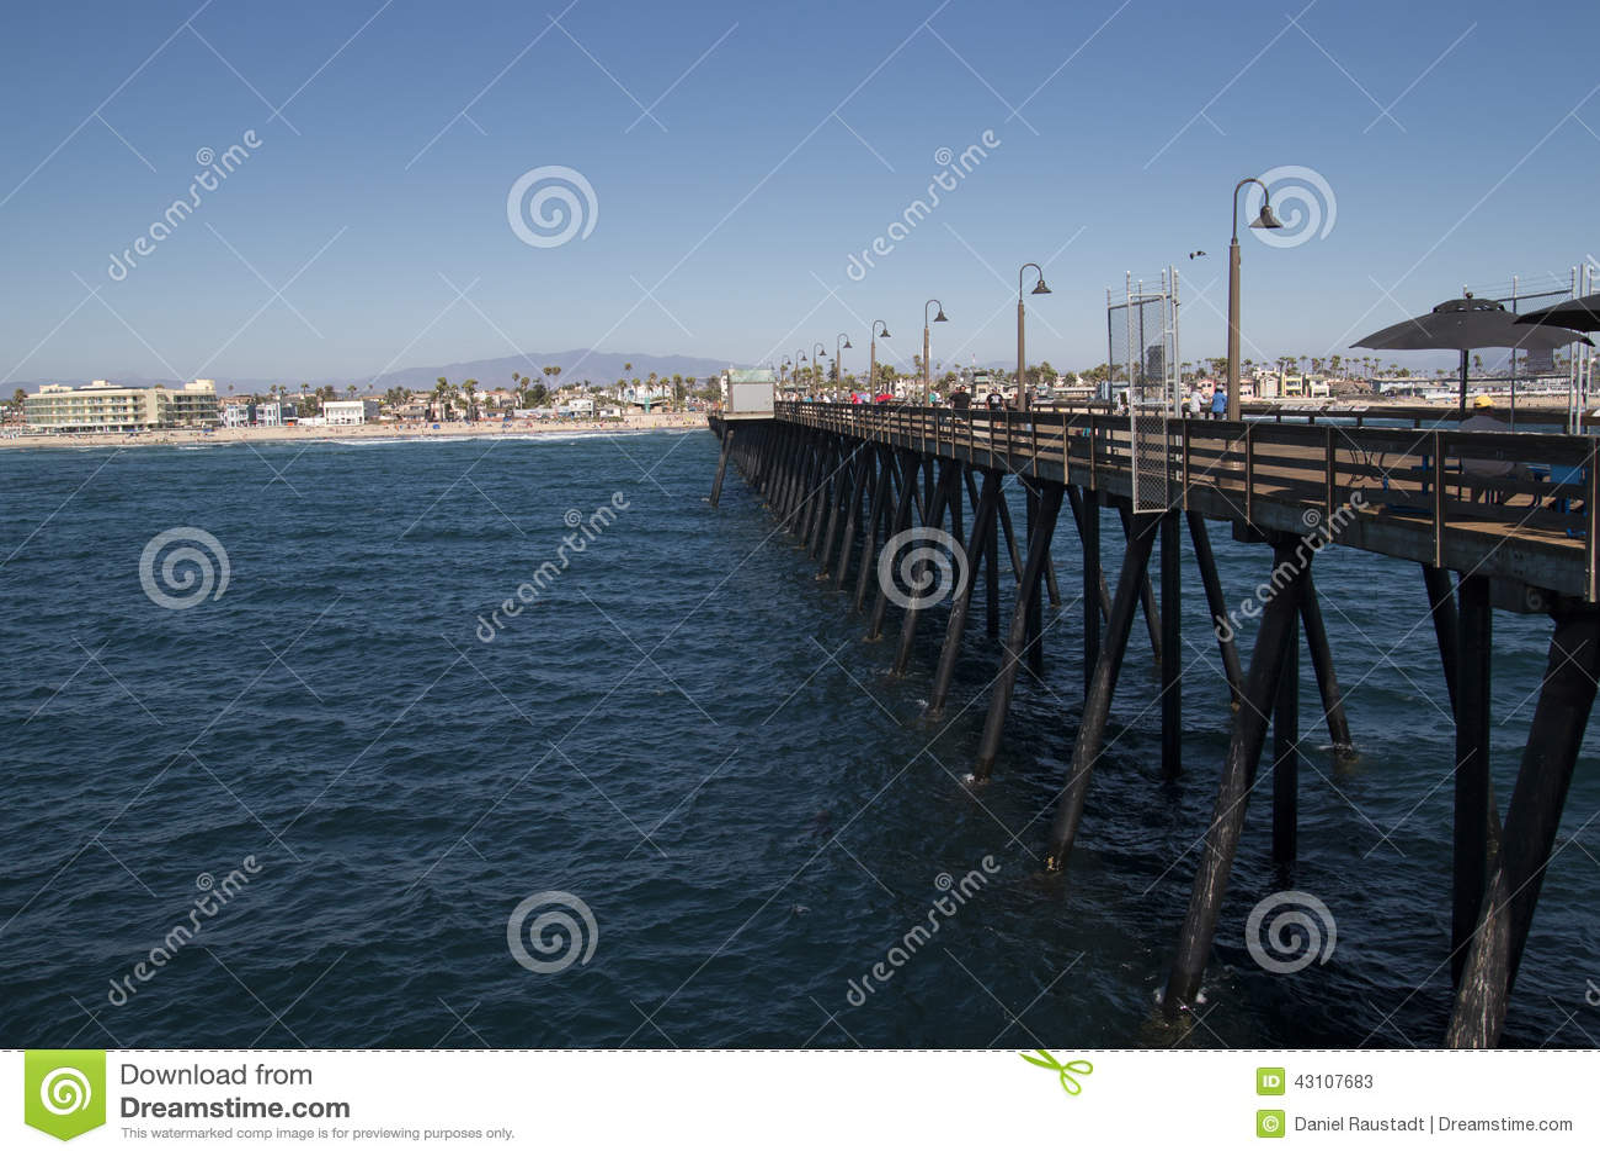 Imperial beach pier near downtown san diego california for Pier fishing san diego